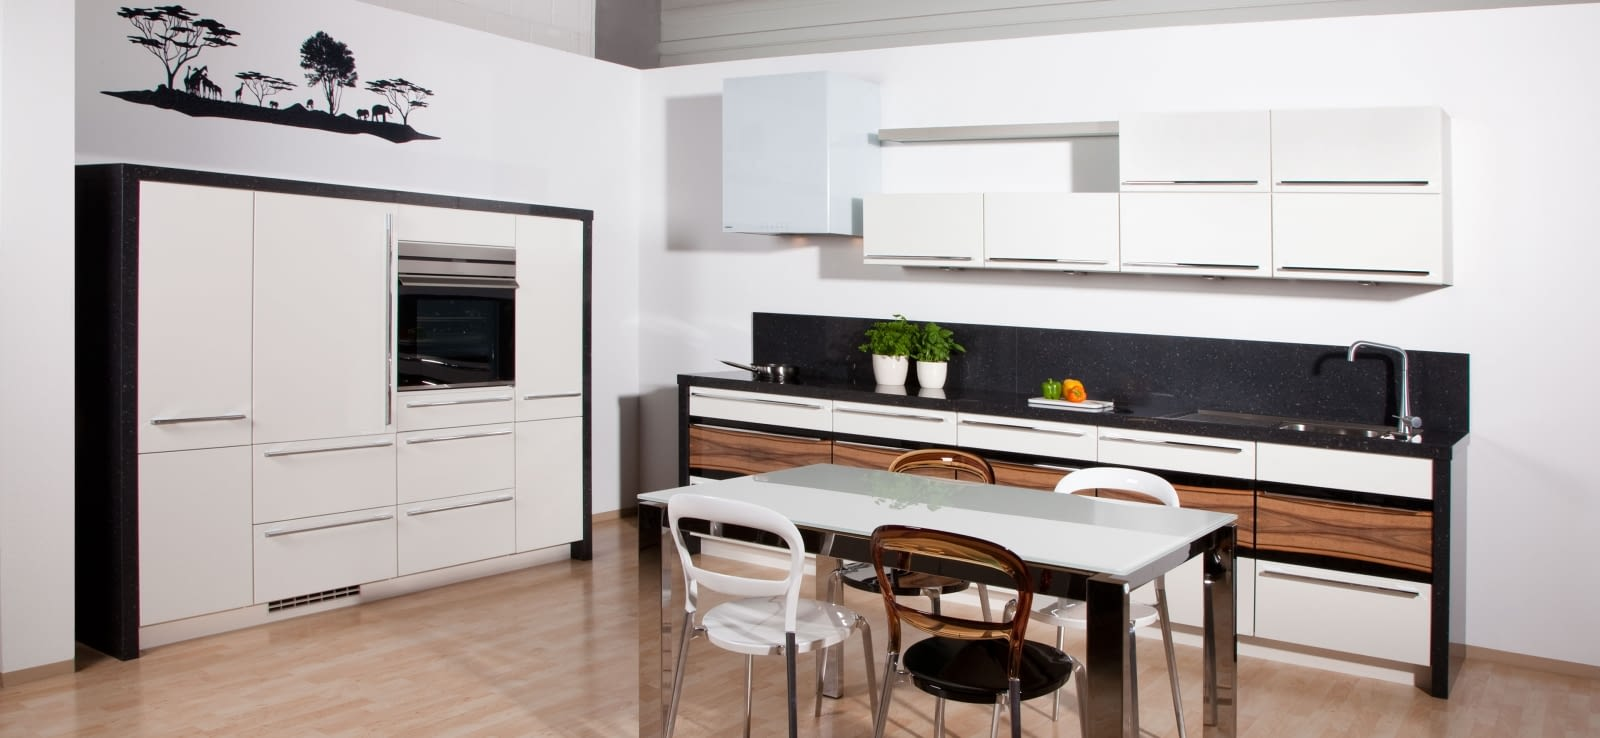 2 zeilen feel highlight mit african silver. Black Bedroom Furniture Sets. Home Design Ideas